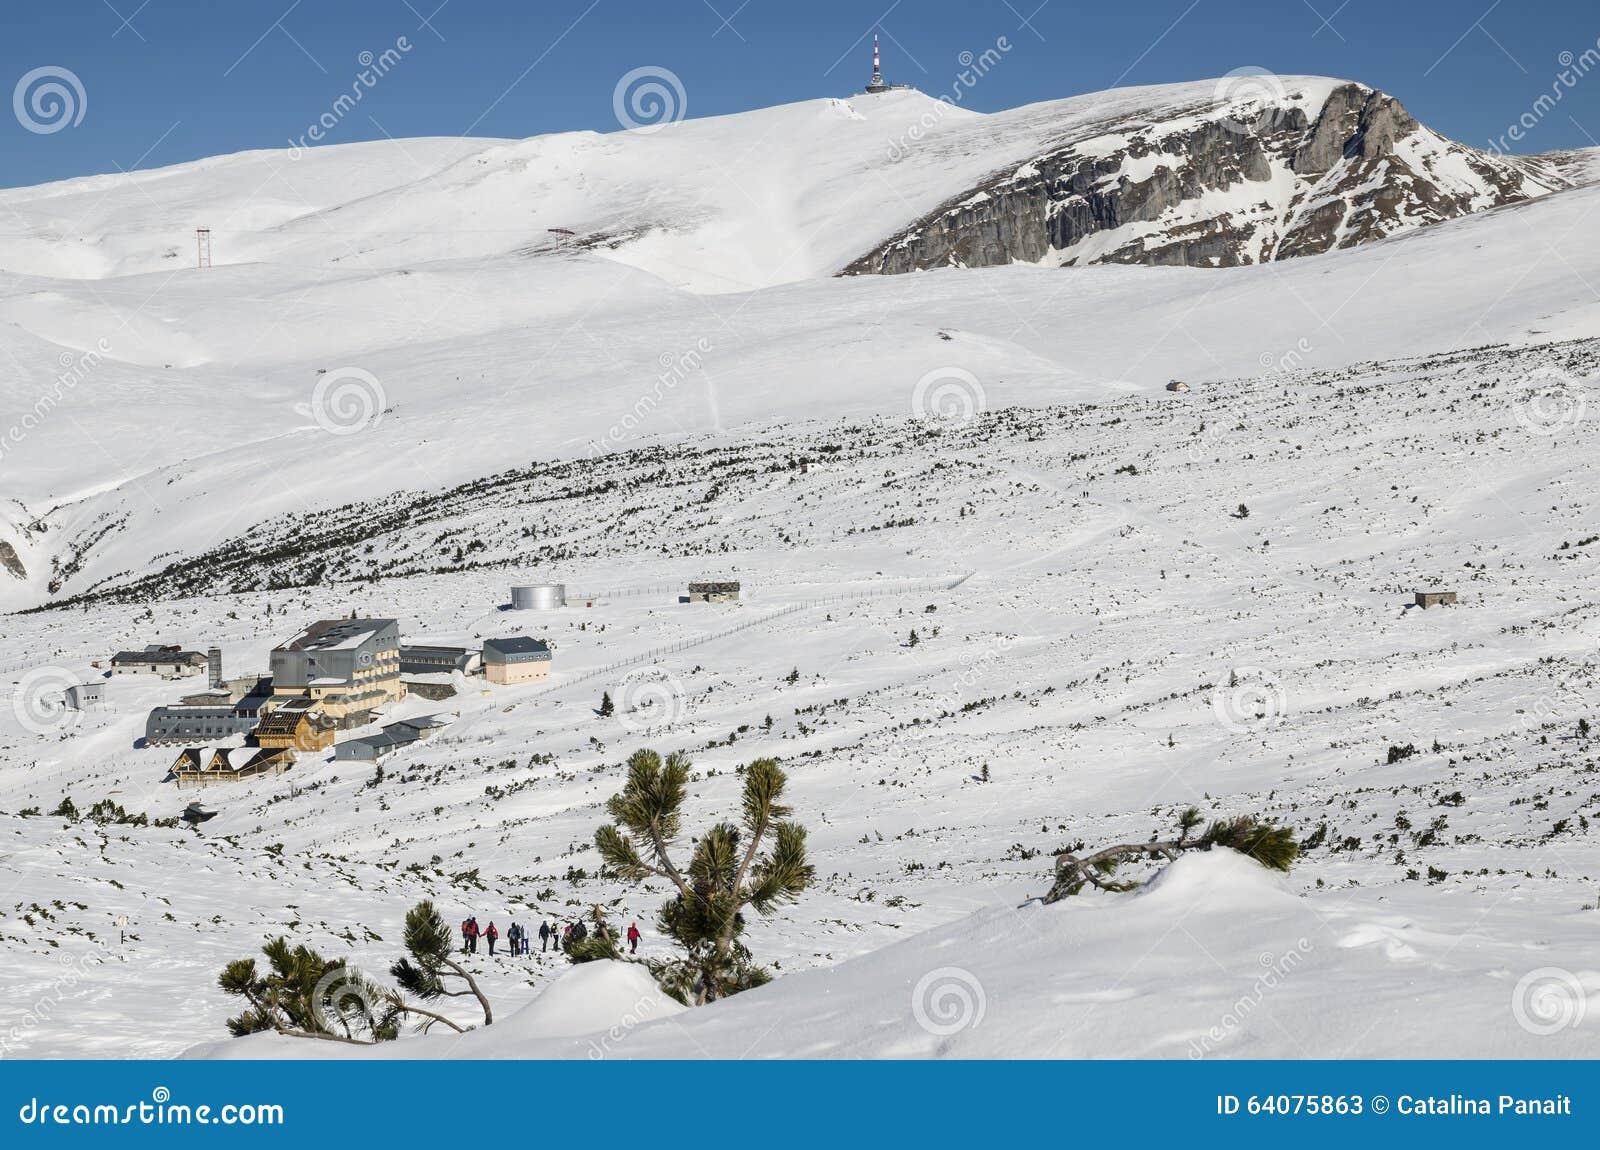 towards the snowy - photo #16